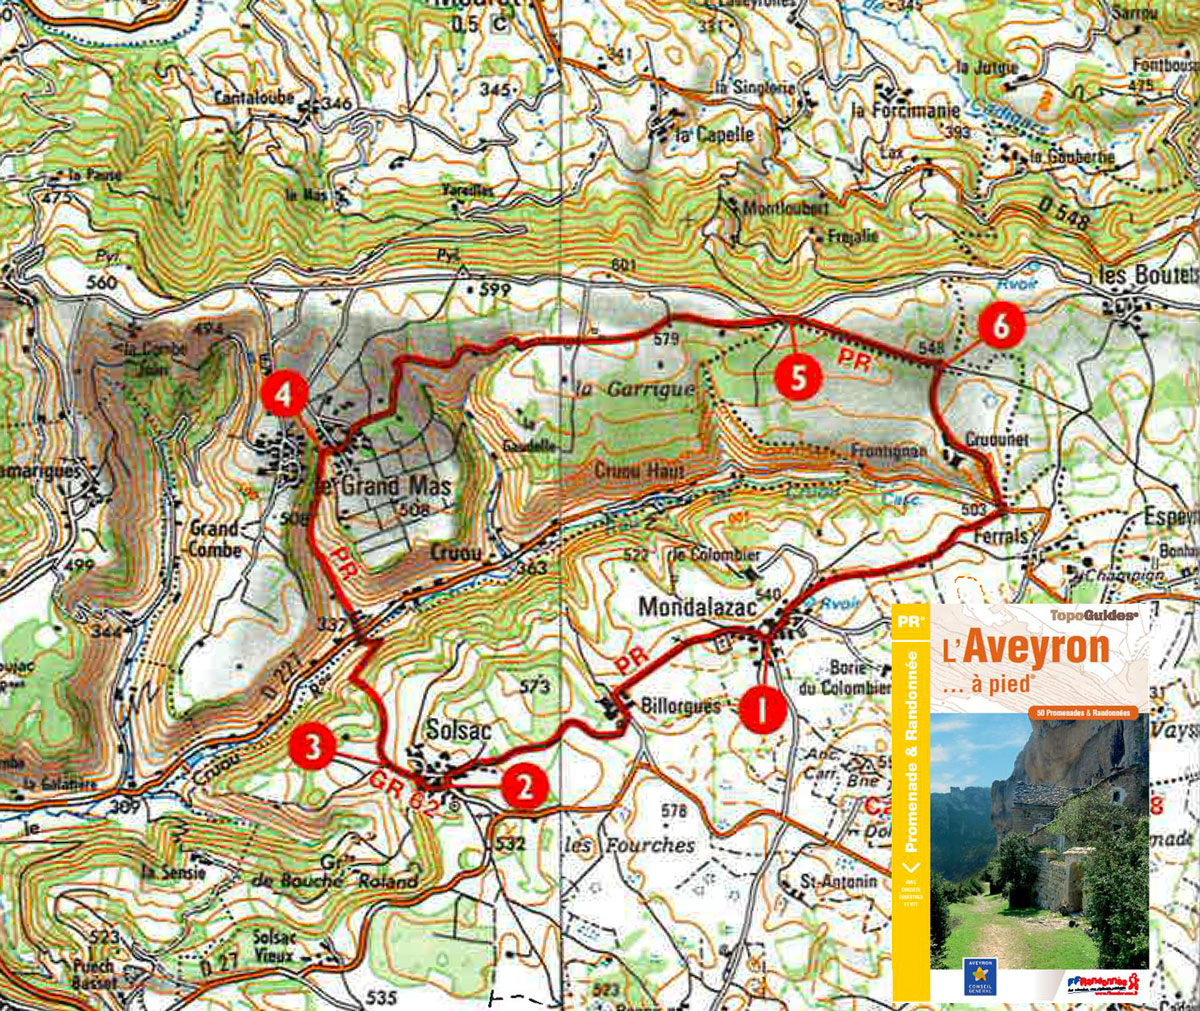 Carte parcours Mondalazac